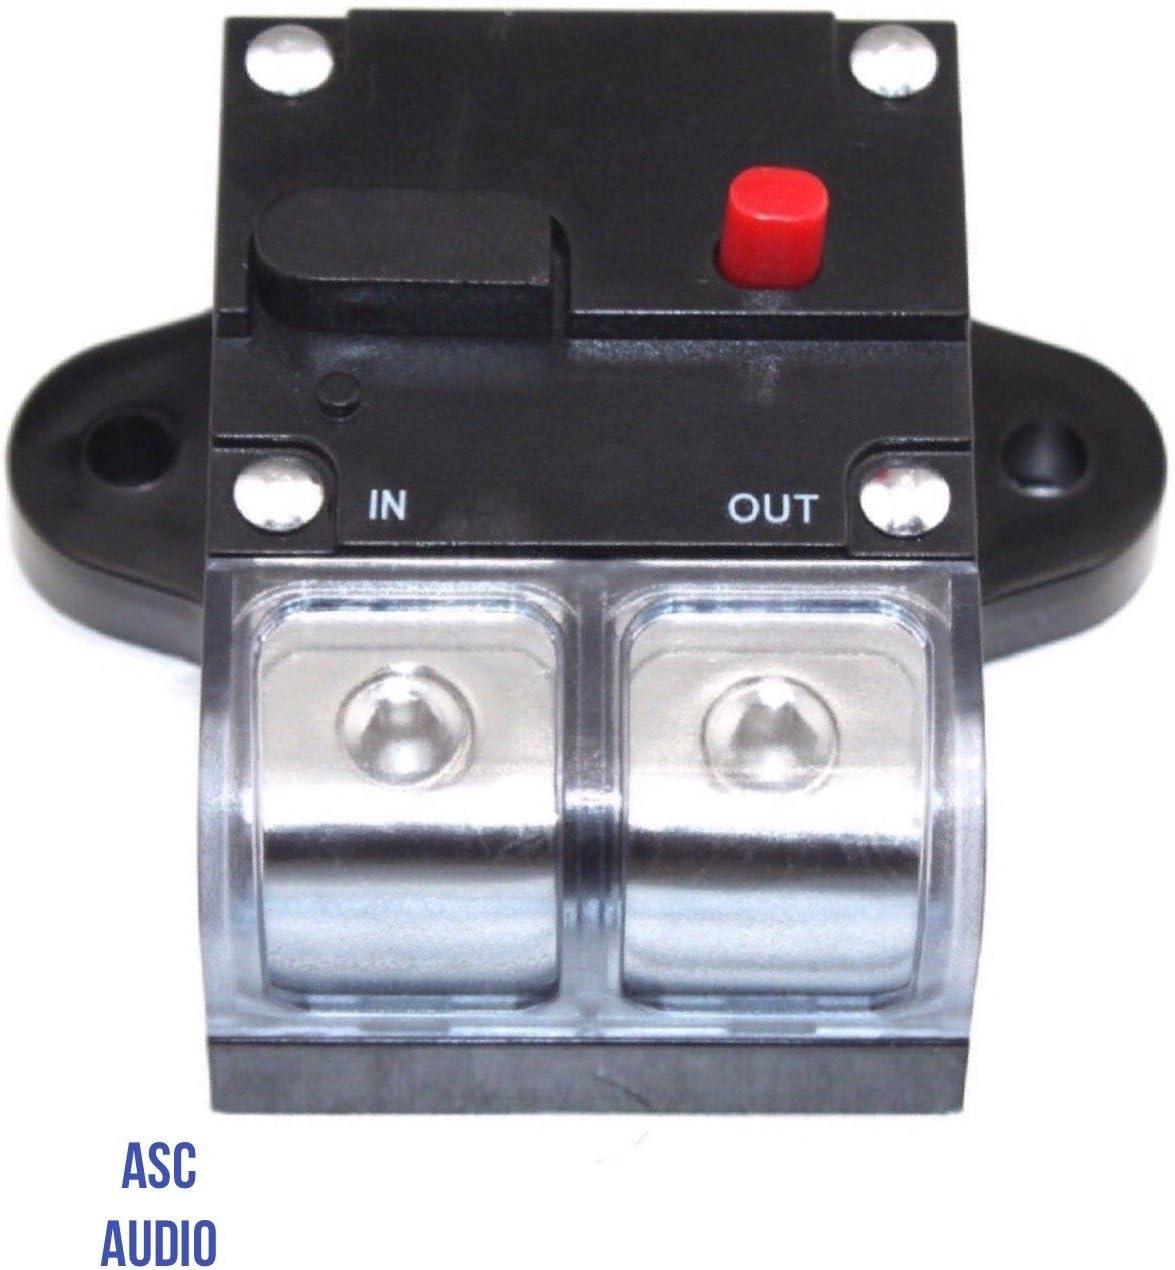 New 300 AMP 0 2 4 Gauge Car Auto Audio Inline Power Circuit Breaker 12V System